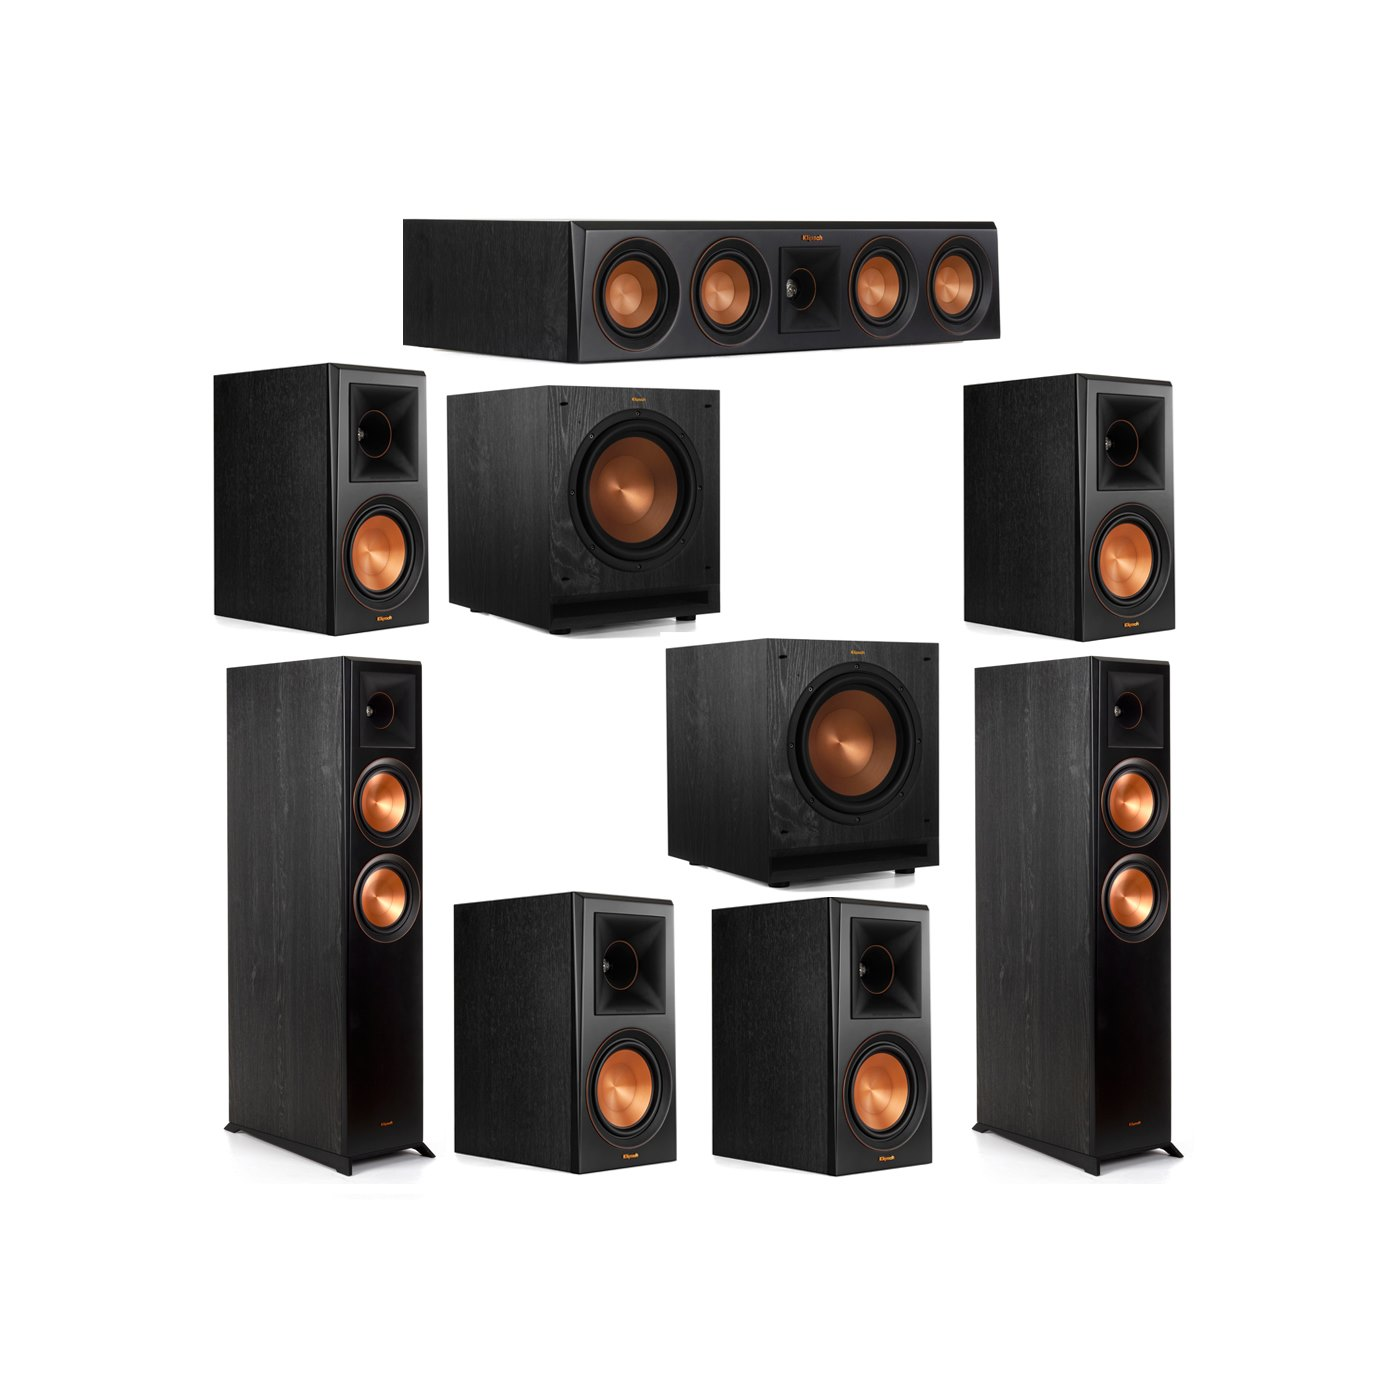 Klipsch 7.2 System with 2 RP-6000F Floorstanding Speakers, 1 Klipsch RP-404C Center Speaker, 4 Klipsch RP-600M Surround Speakers, 2 Klipsch SPL-100 Subwoofers